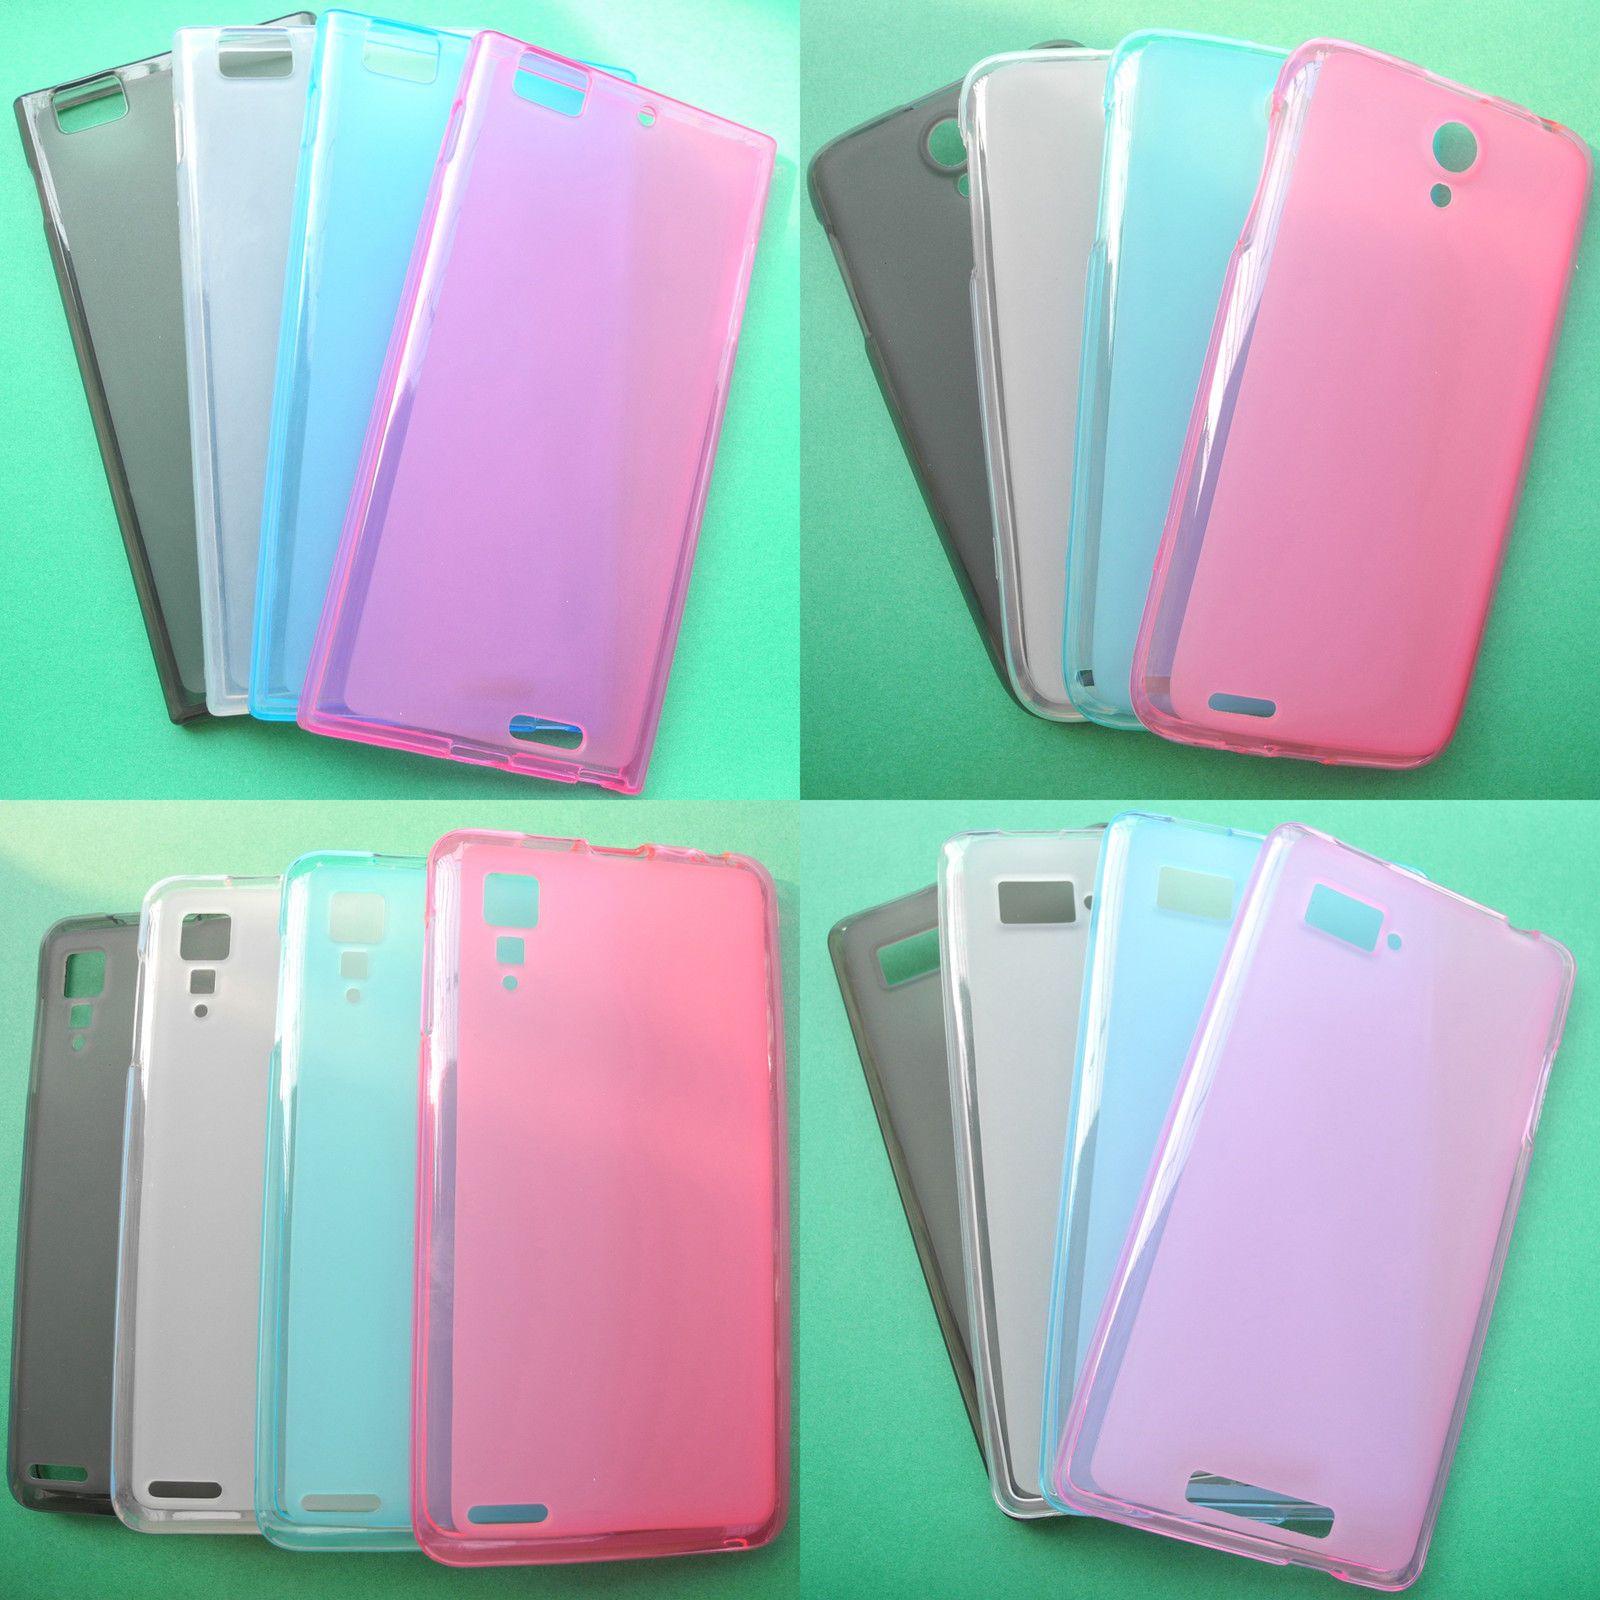 5.89 GBP - For Medion Life E5004 / S5004 Smartphone Soft Tpu Phone ...